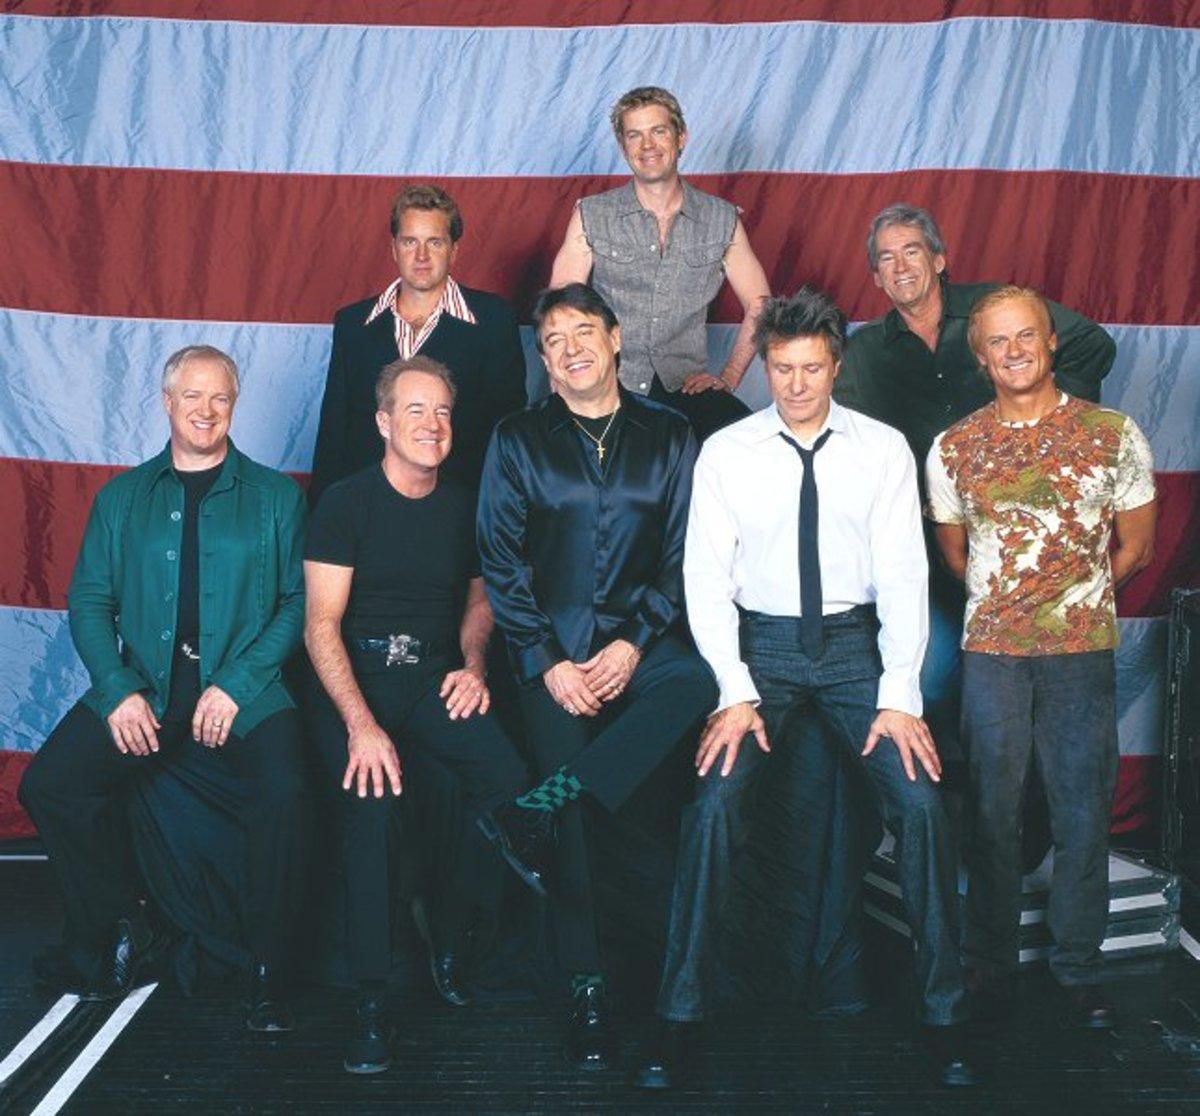 Jason Scheff; Keith Howland;  Bill Champlin; Lee Loughnane;  James Pankow; Walt Parazaider;  Robert Lamm; Tris Imboden